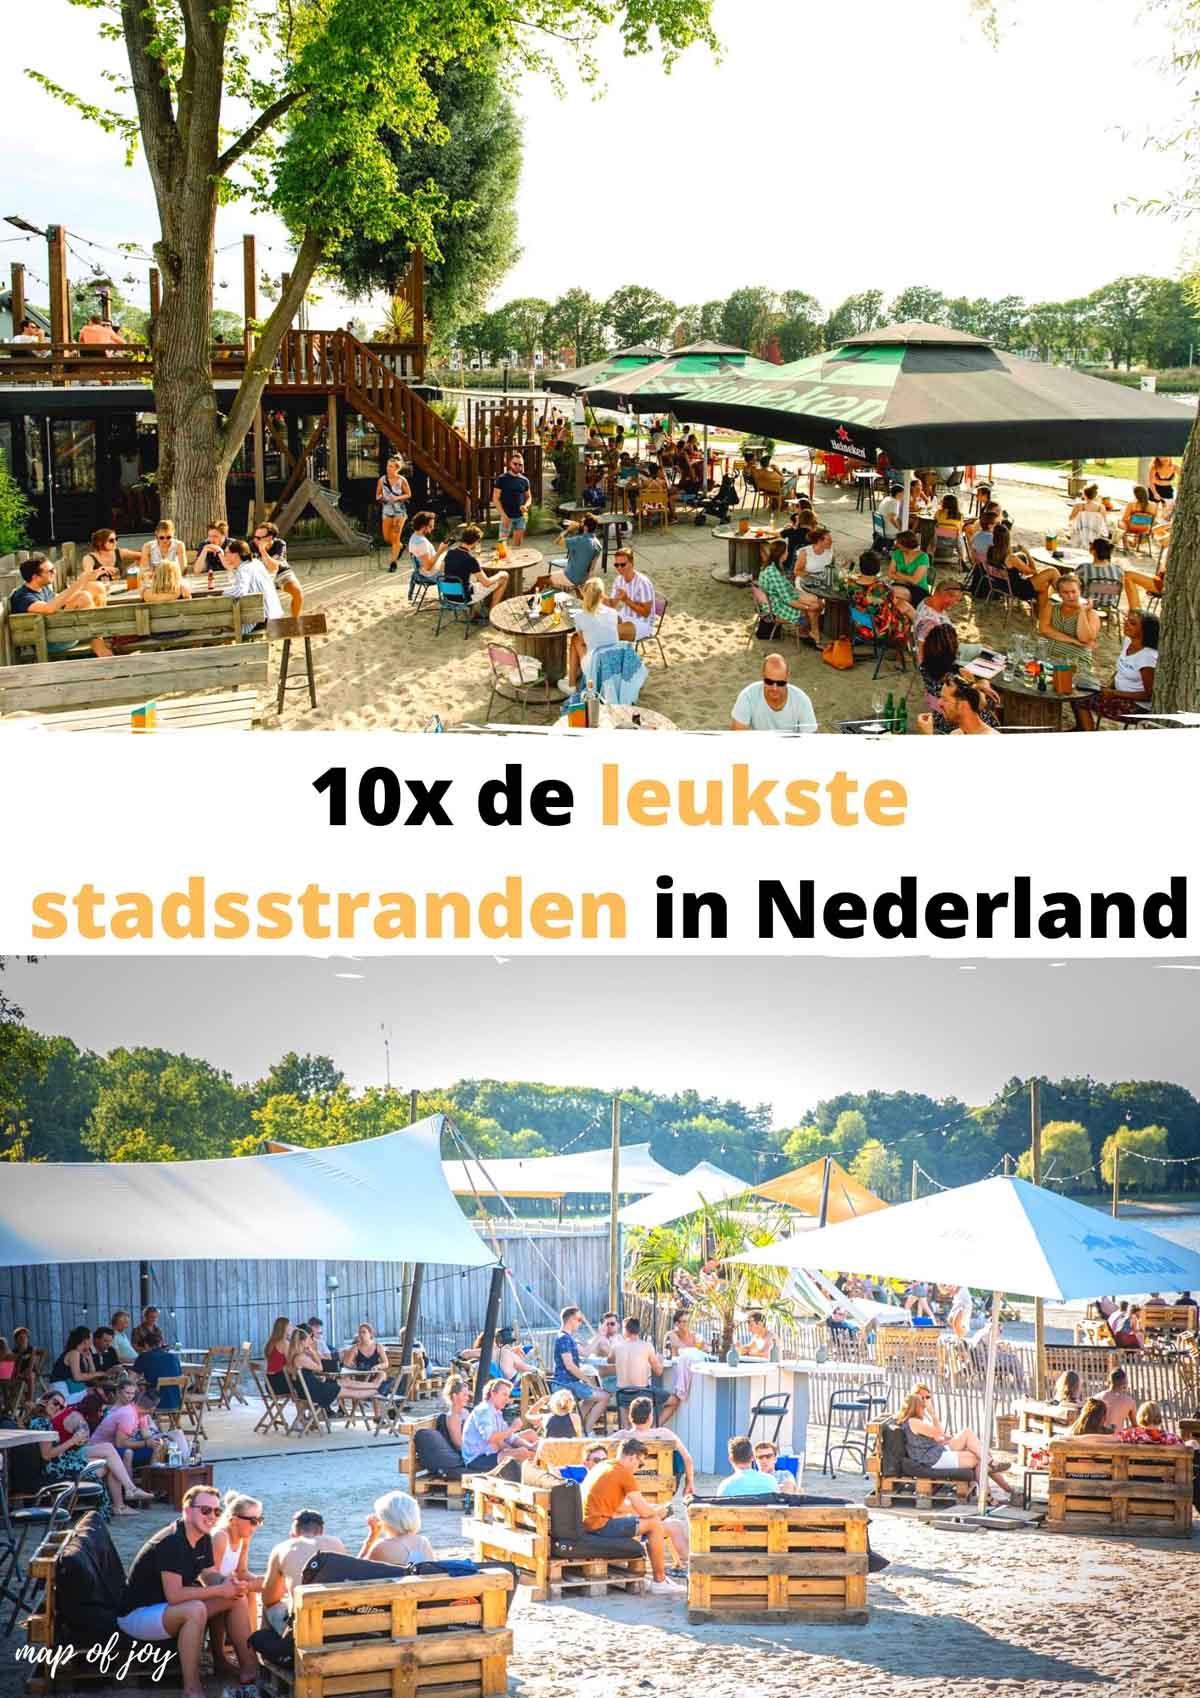 De leukste stadsstranden in Nederland